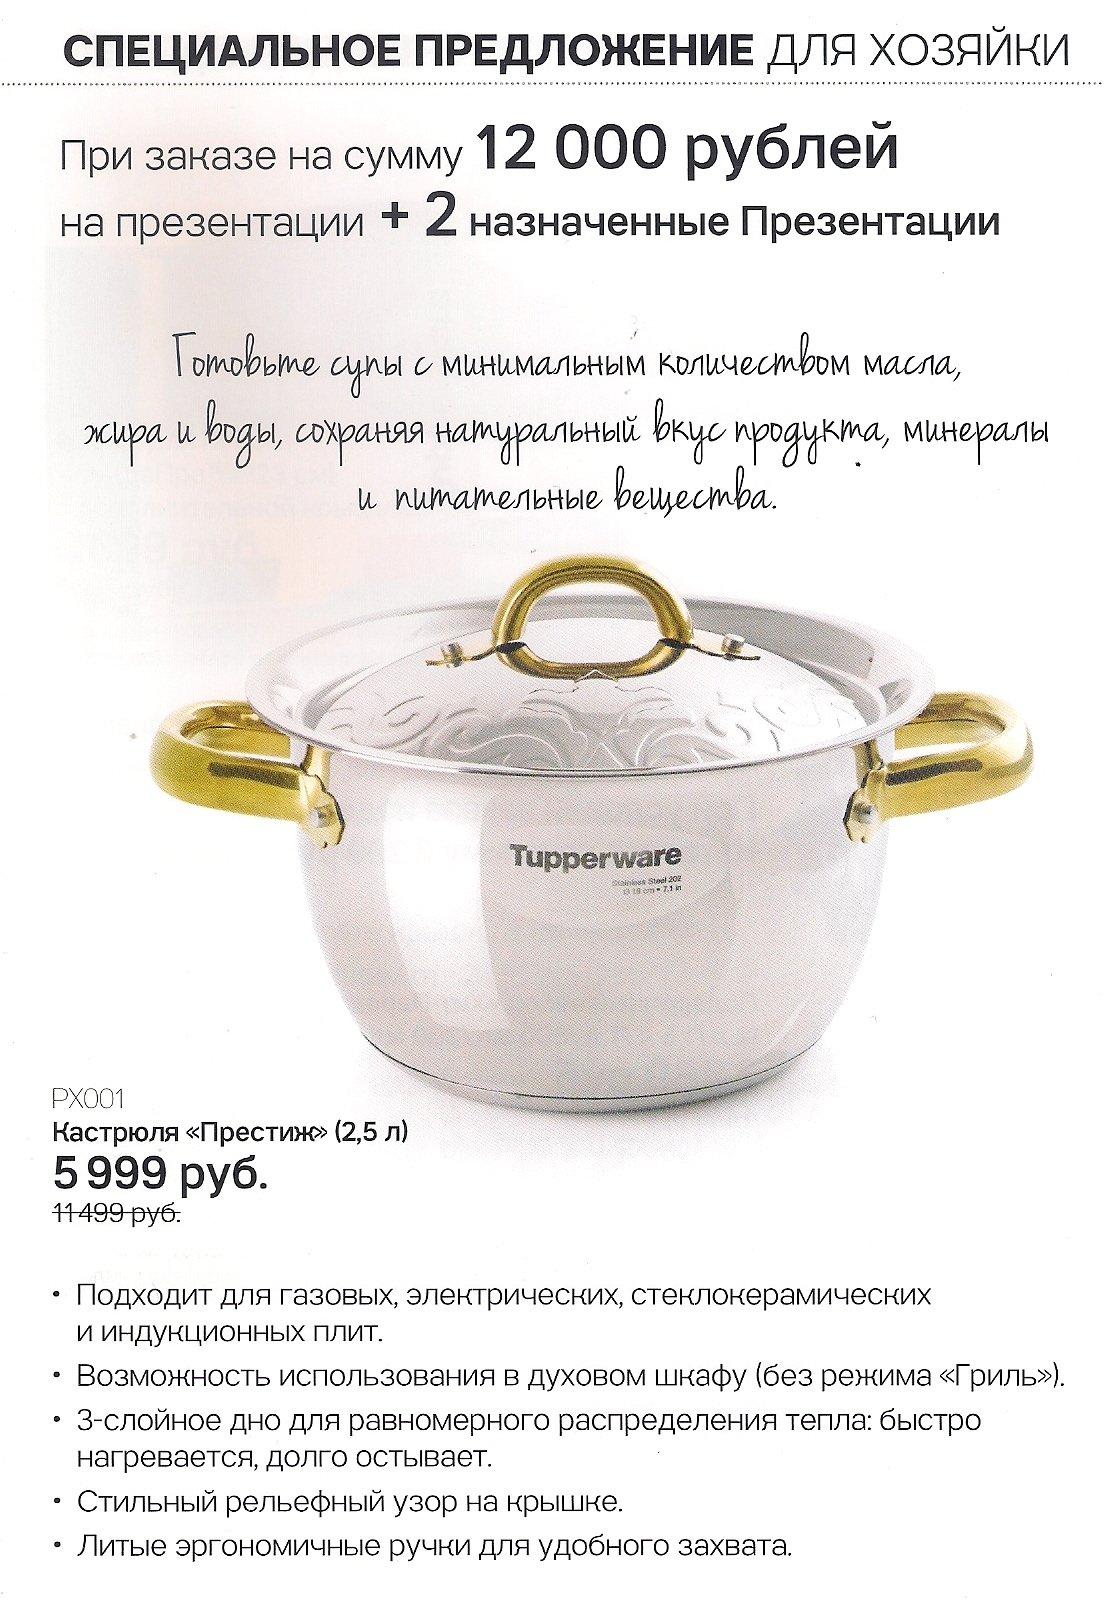 https://tupperware-online.ru/images/upload/7g.jpg